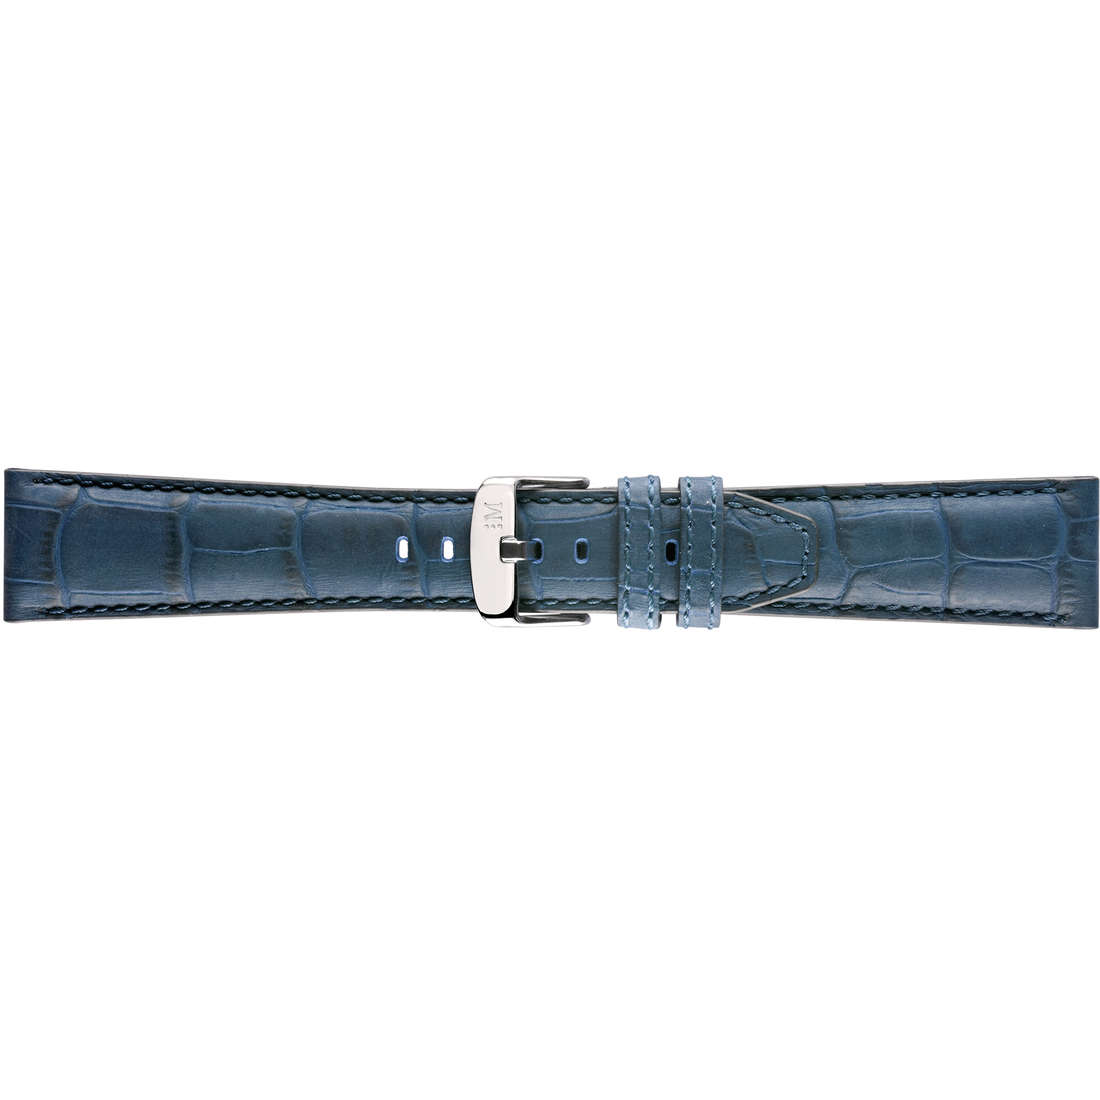 watch watch bands watch straps man Morellato Linea Sport A01X4497B44062CR20